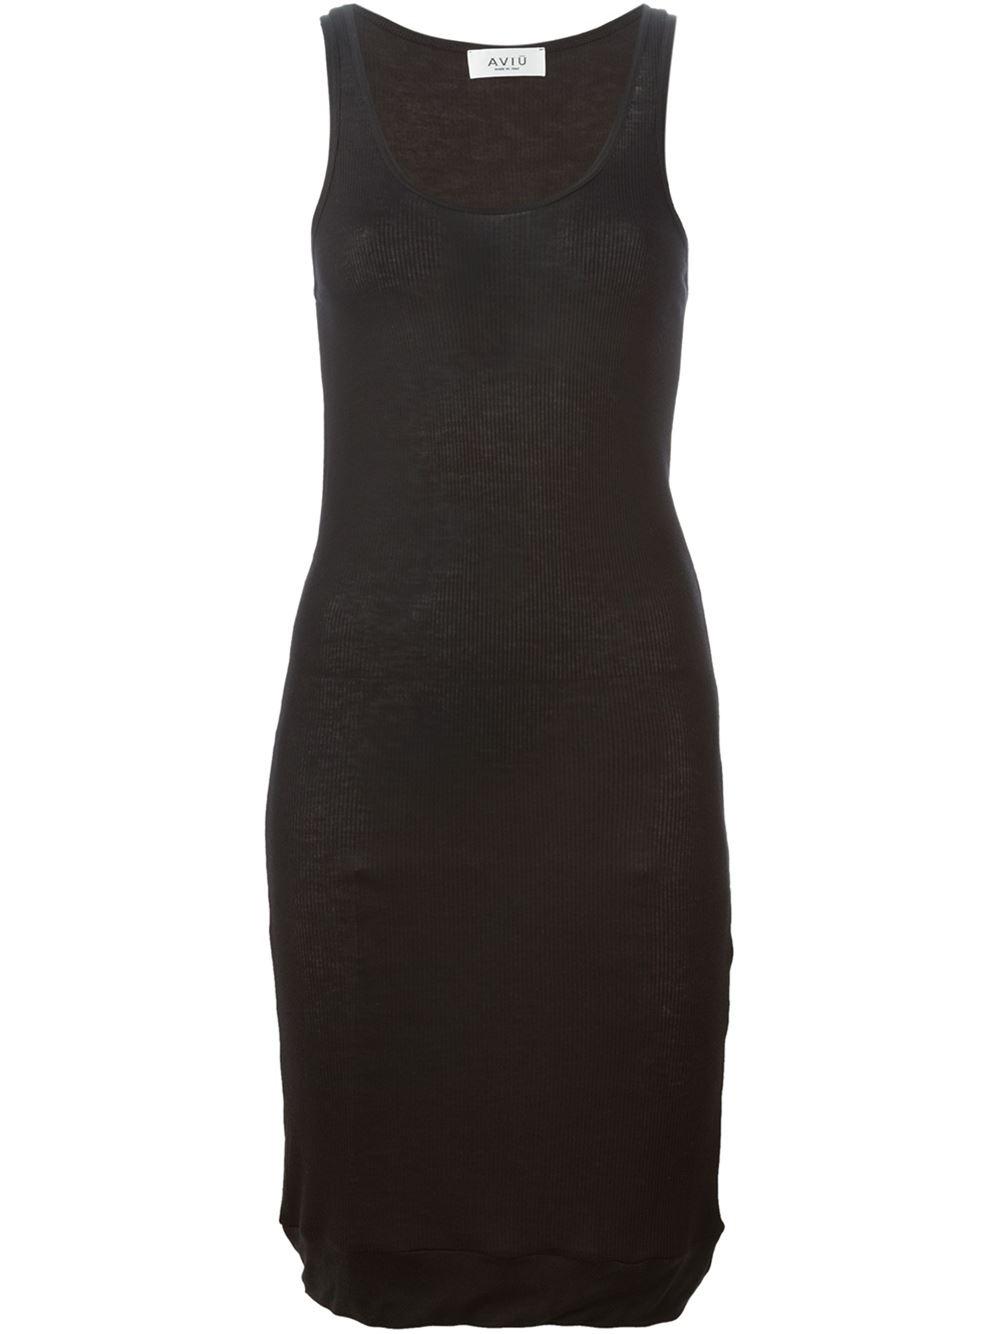 Lyst - Aviu Sleeveless Dress in Black